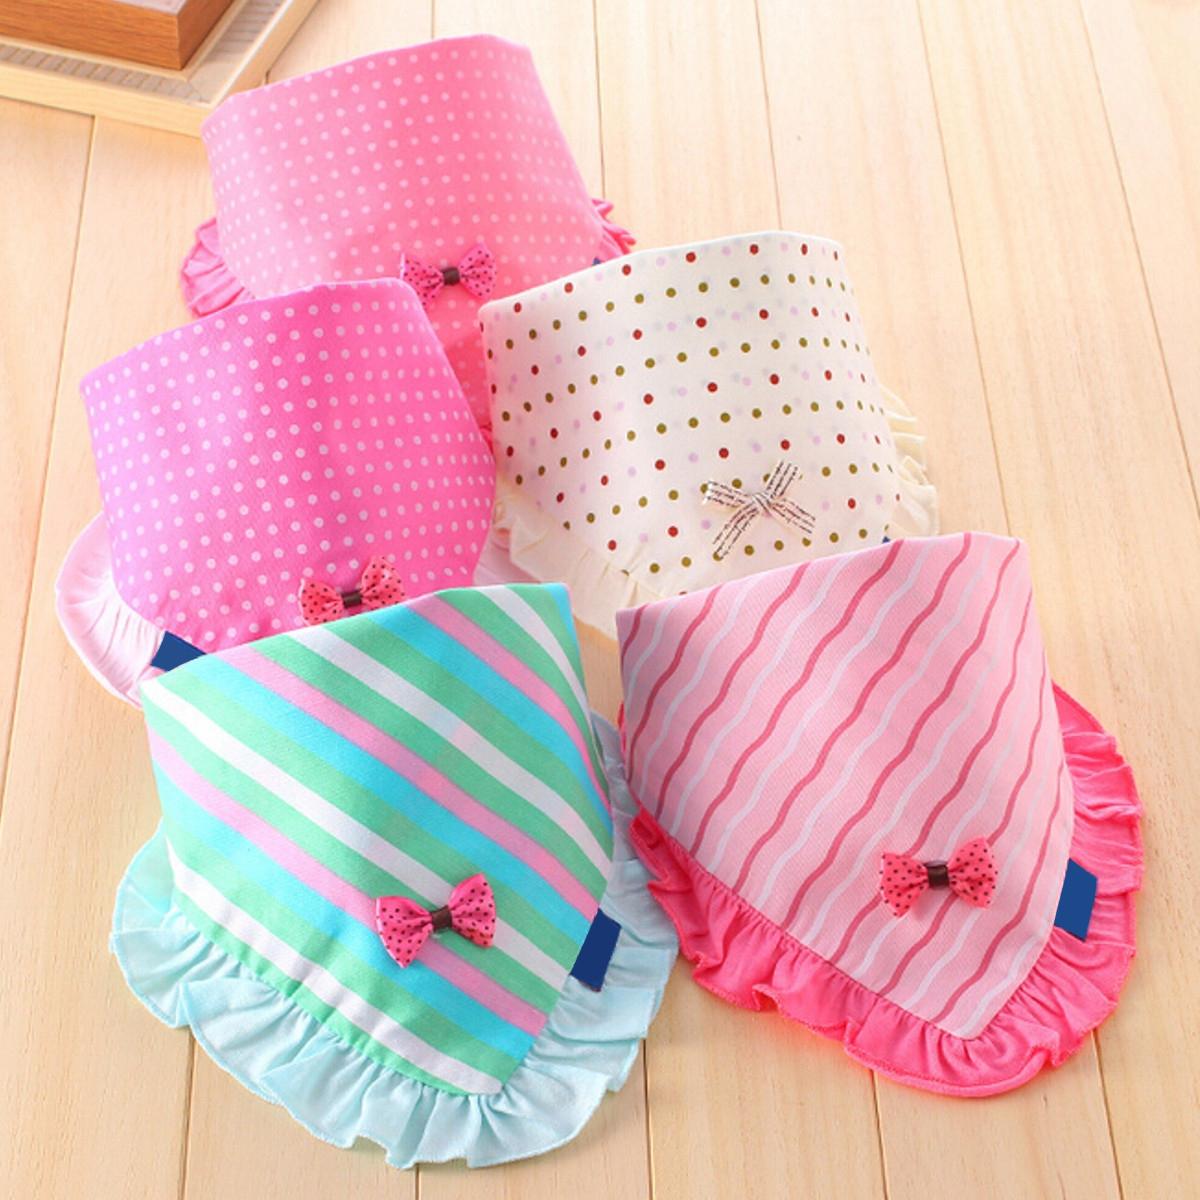 High Quality Baby Girls Bibs Toddler Bandana Triangle Head Scarf Cute Saliva Towel Cotton For Baby Bandana Bibs Multicolor(China (Mainland))